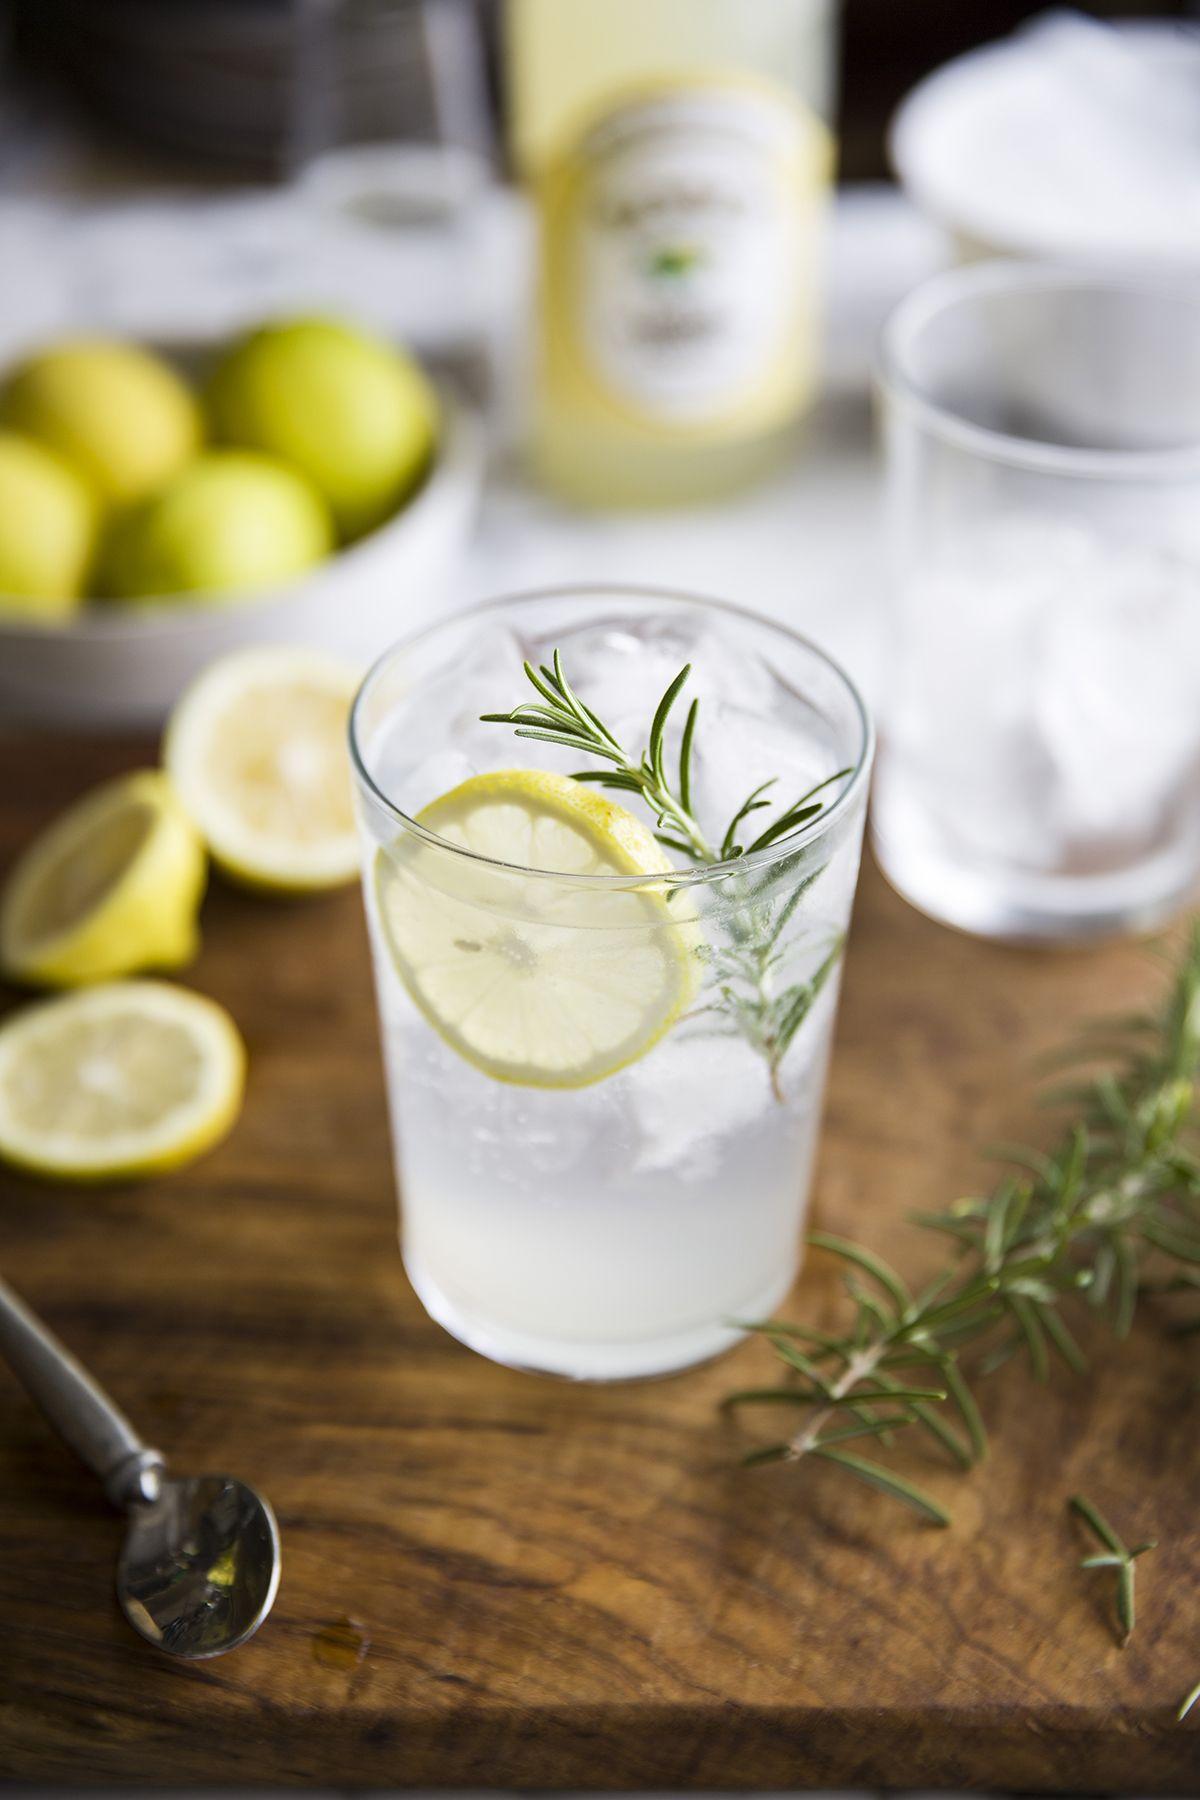 gin & tonic with lemon cordial & rosemary Gin, tonic